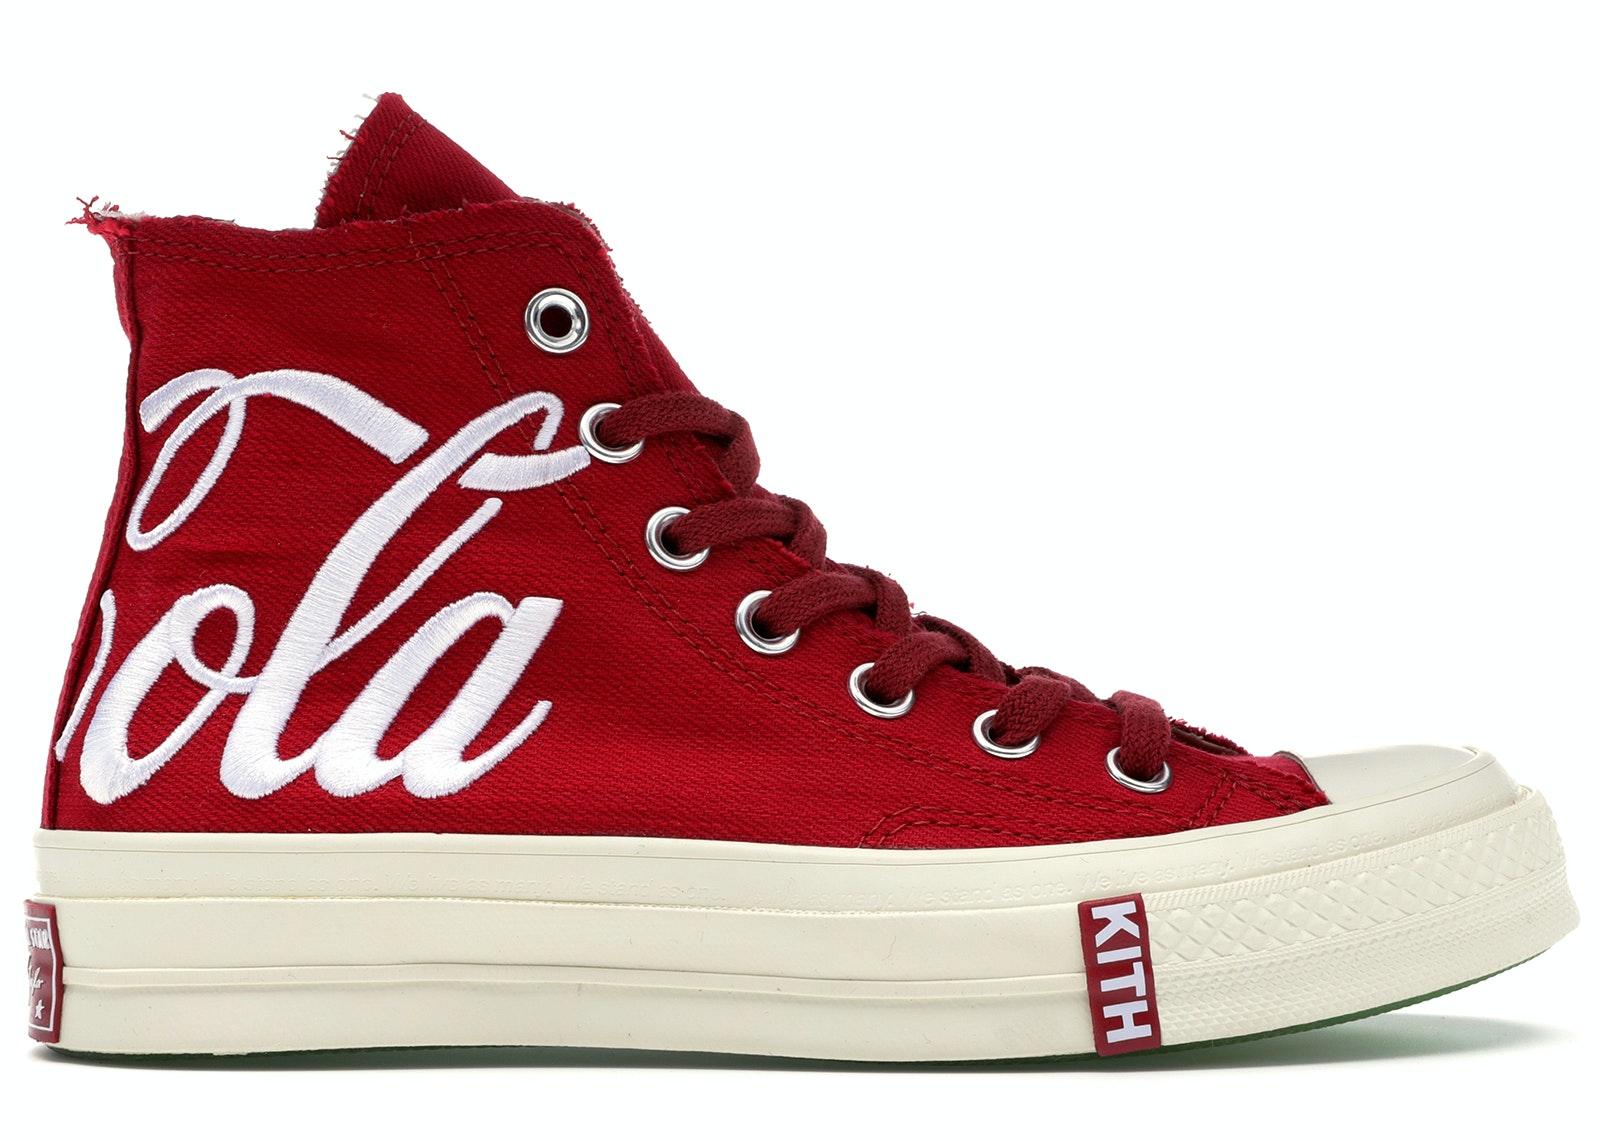 Converse Chuck Taylor All-Star 70s Hi Kith x Coca Cola Red